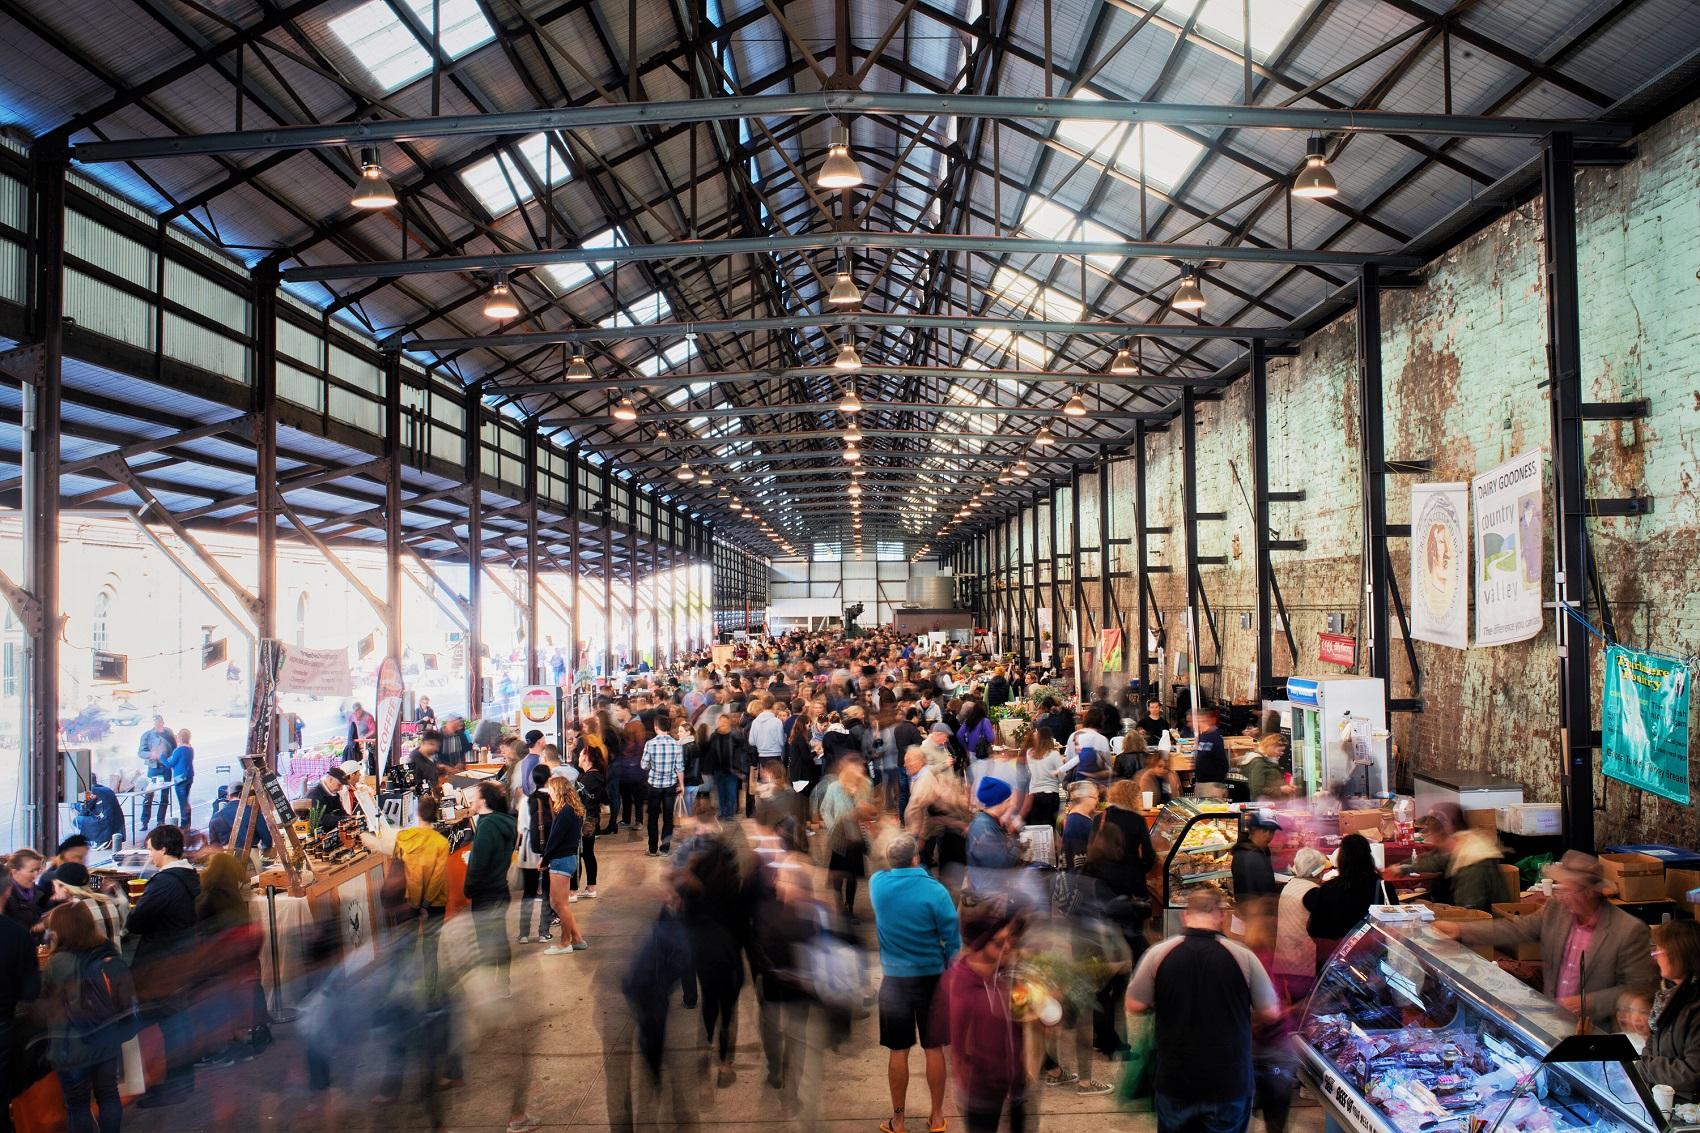 carriageworks-farmers-market-sydney